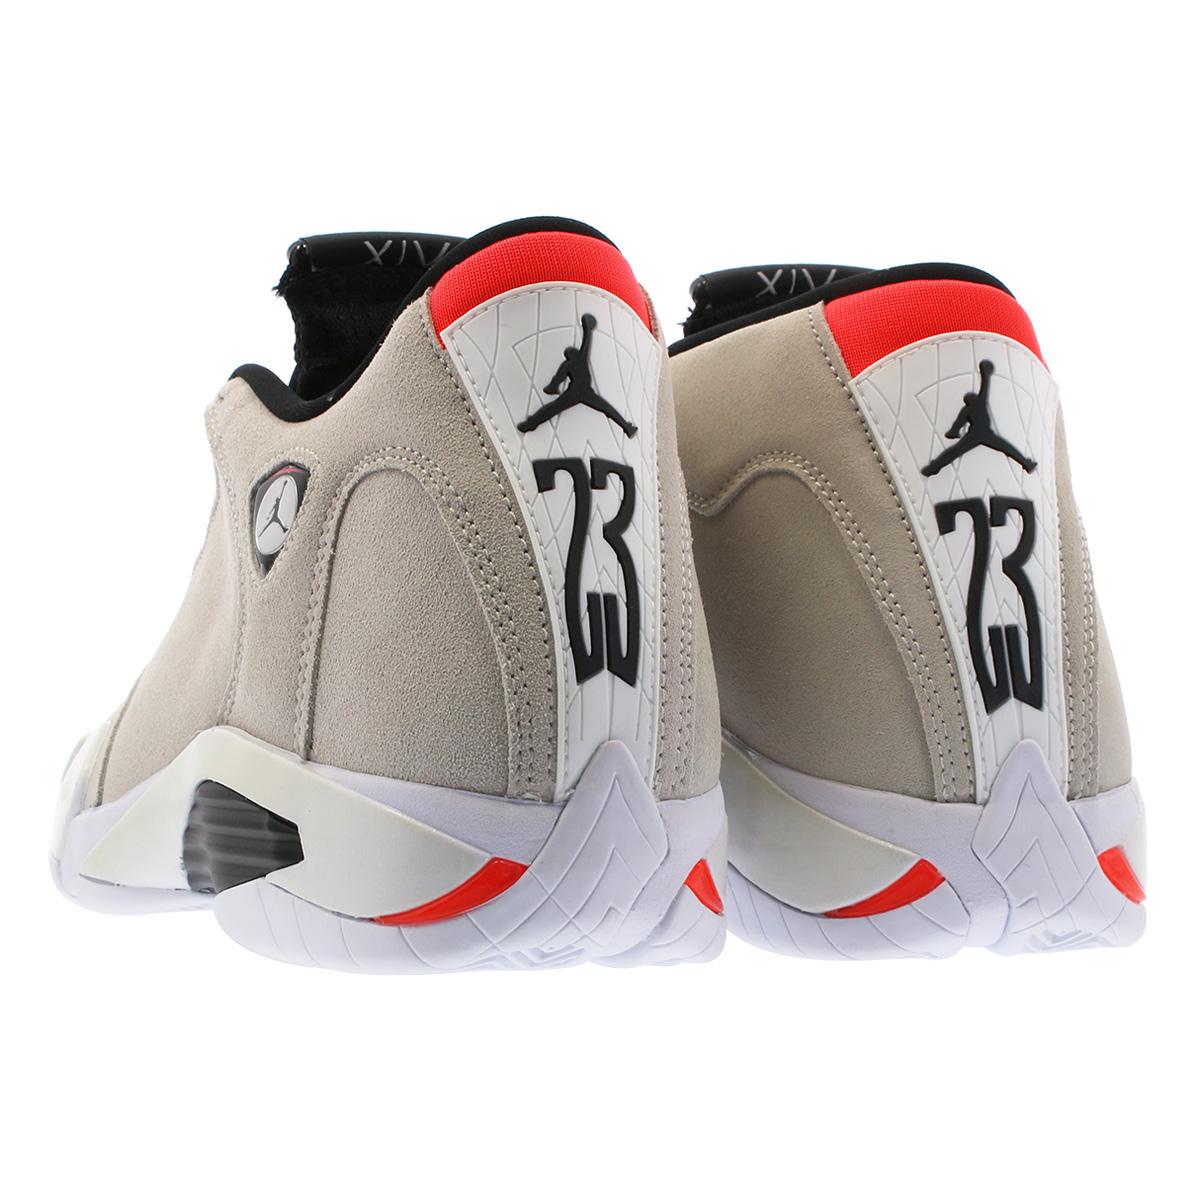 9c99889694ea NIKE AIR JORDAN 14 RETRO Nike Air Jordan 14 nostalgic DESERT SAND BLACK  WHITE INFRARED 23 487